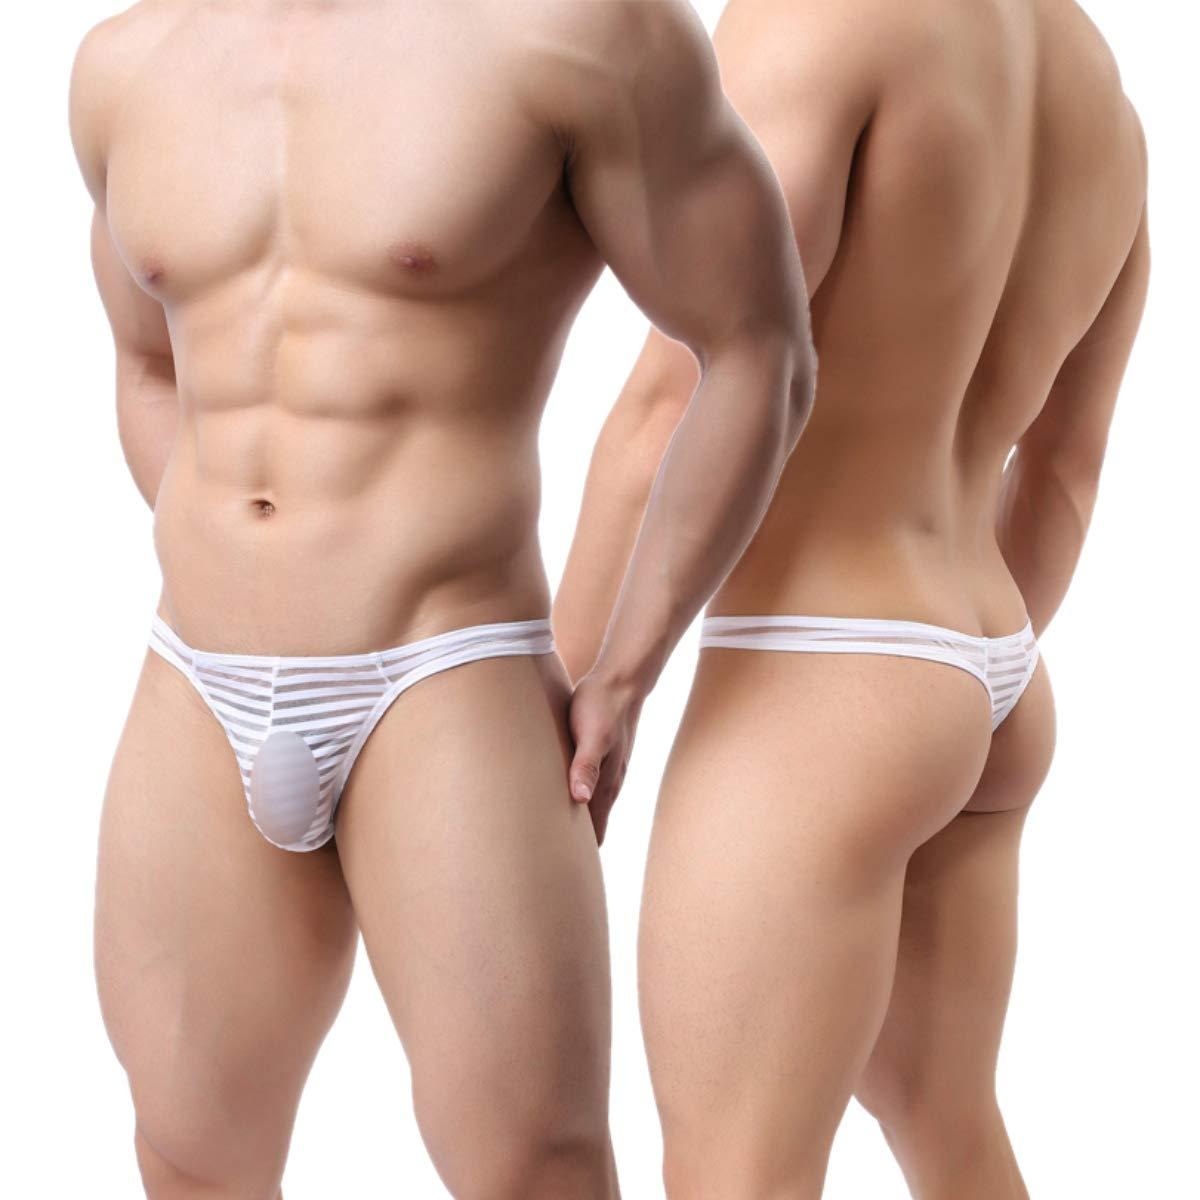 MuscleMate UltraHot Men's See Through Thong Underwear, Men's G-String Thong, Top Quality Men' s G-String Thong